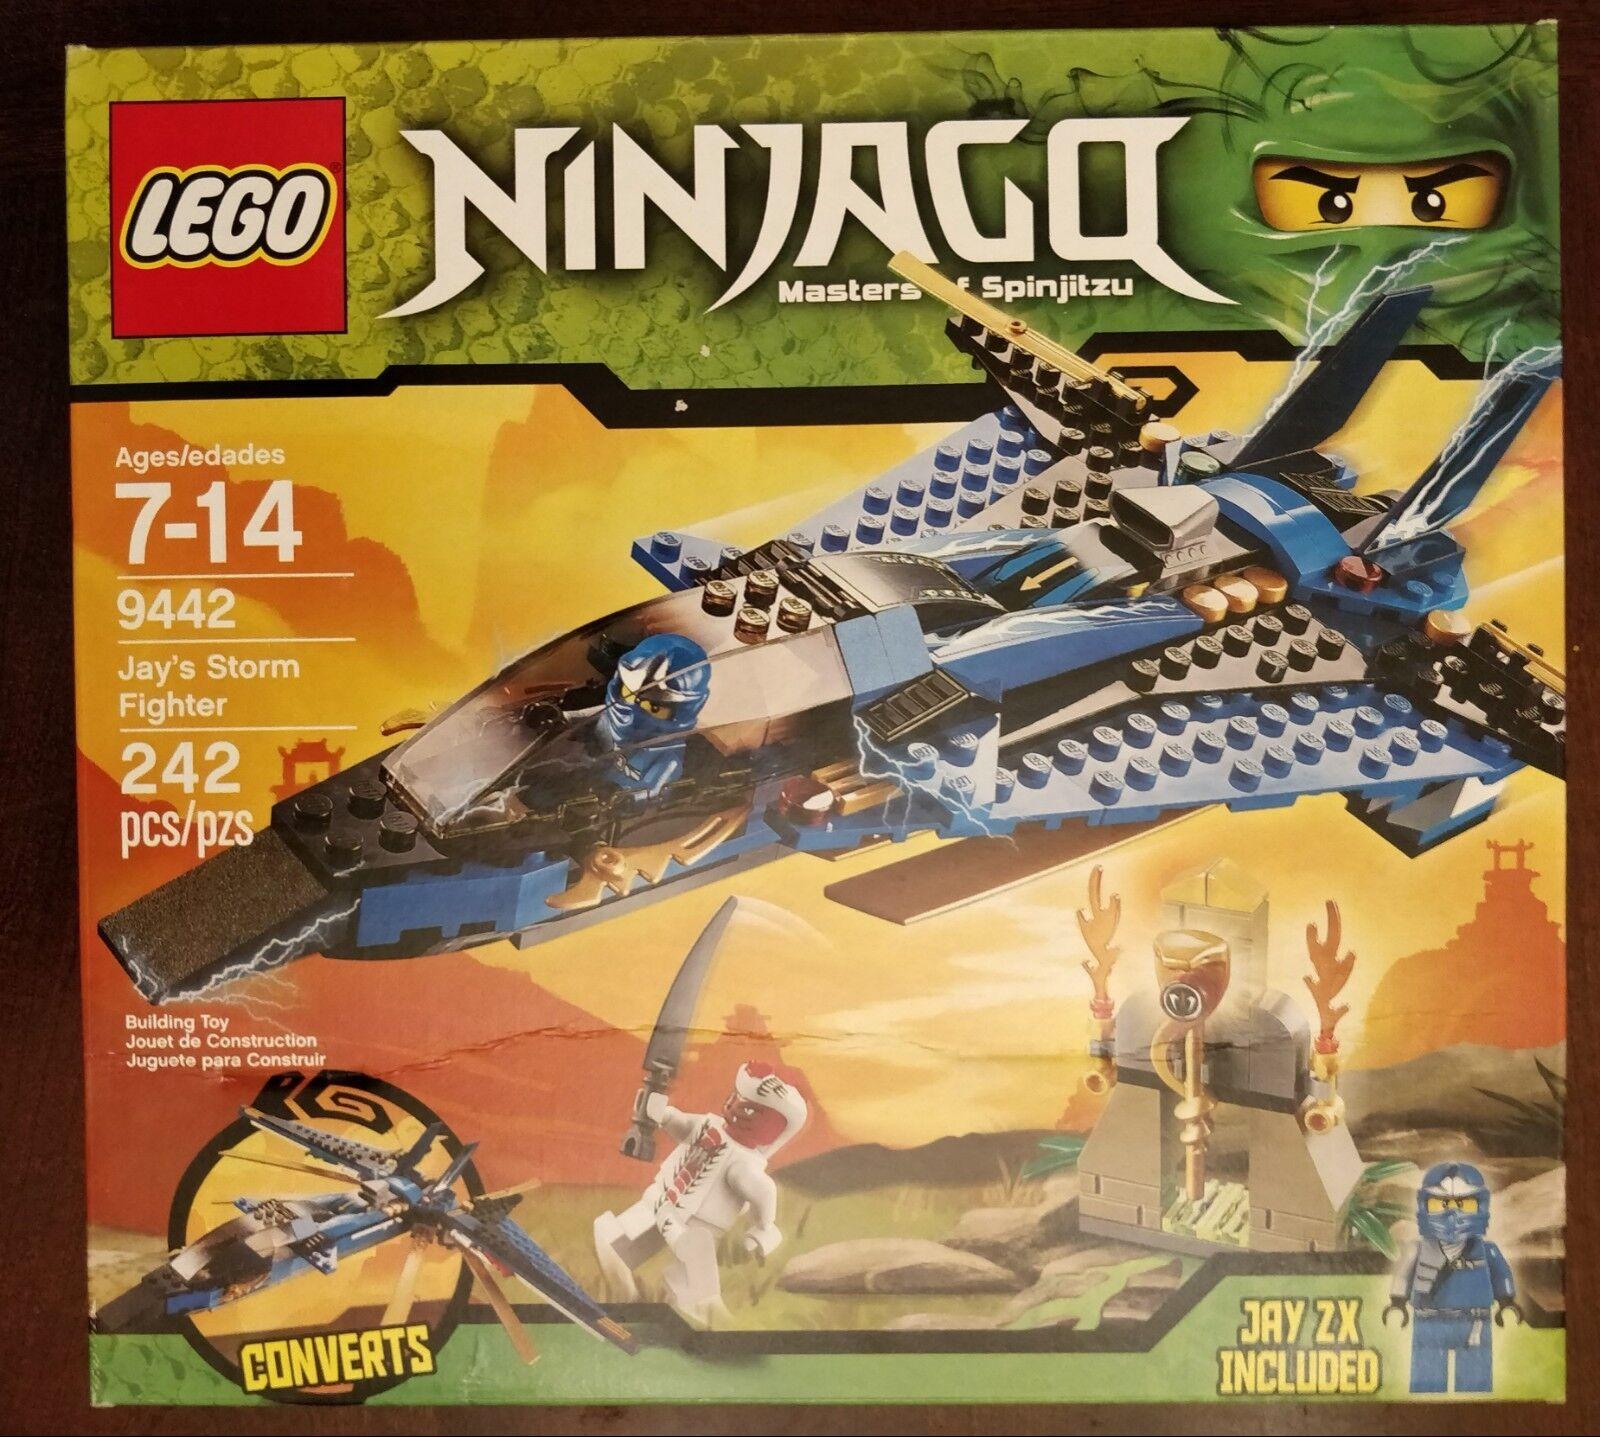 LEGO Ninjago Jay's Storm combatiente (9442), nuovo IN  scatola FACTORY SEALED  nessun minimo